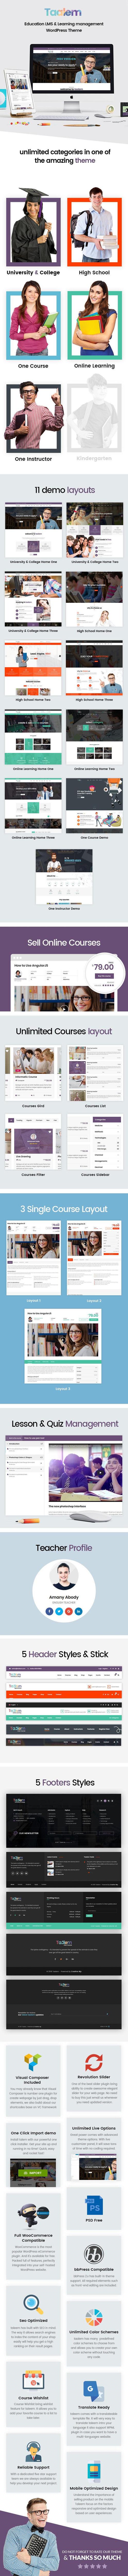 Taalem – Education LMS WordPress Theme - 4